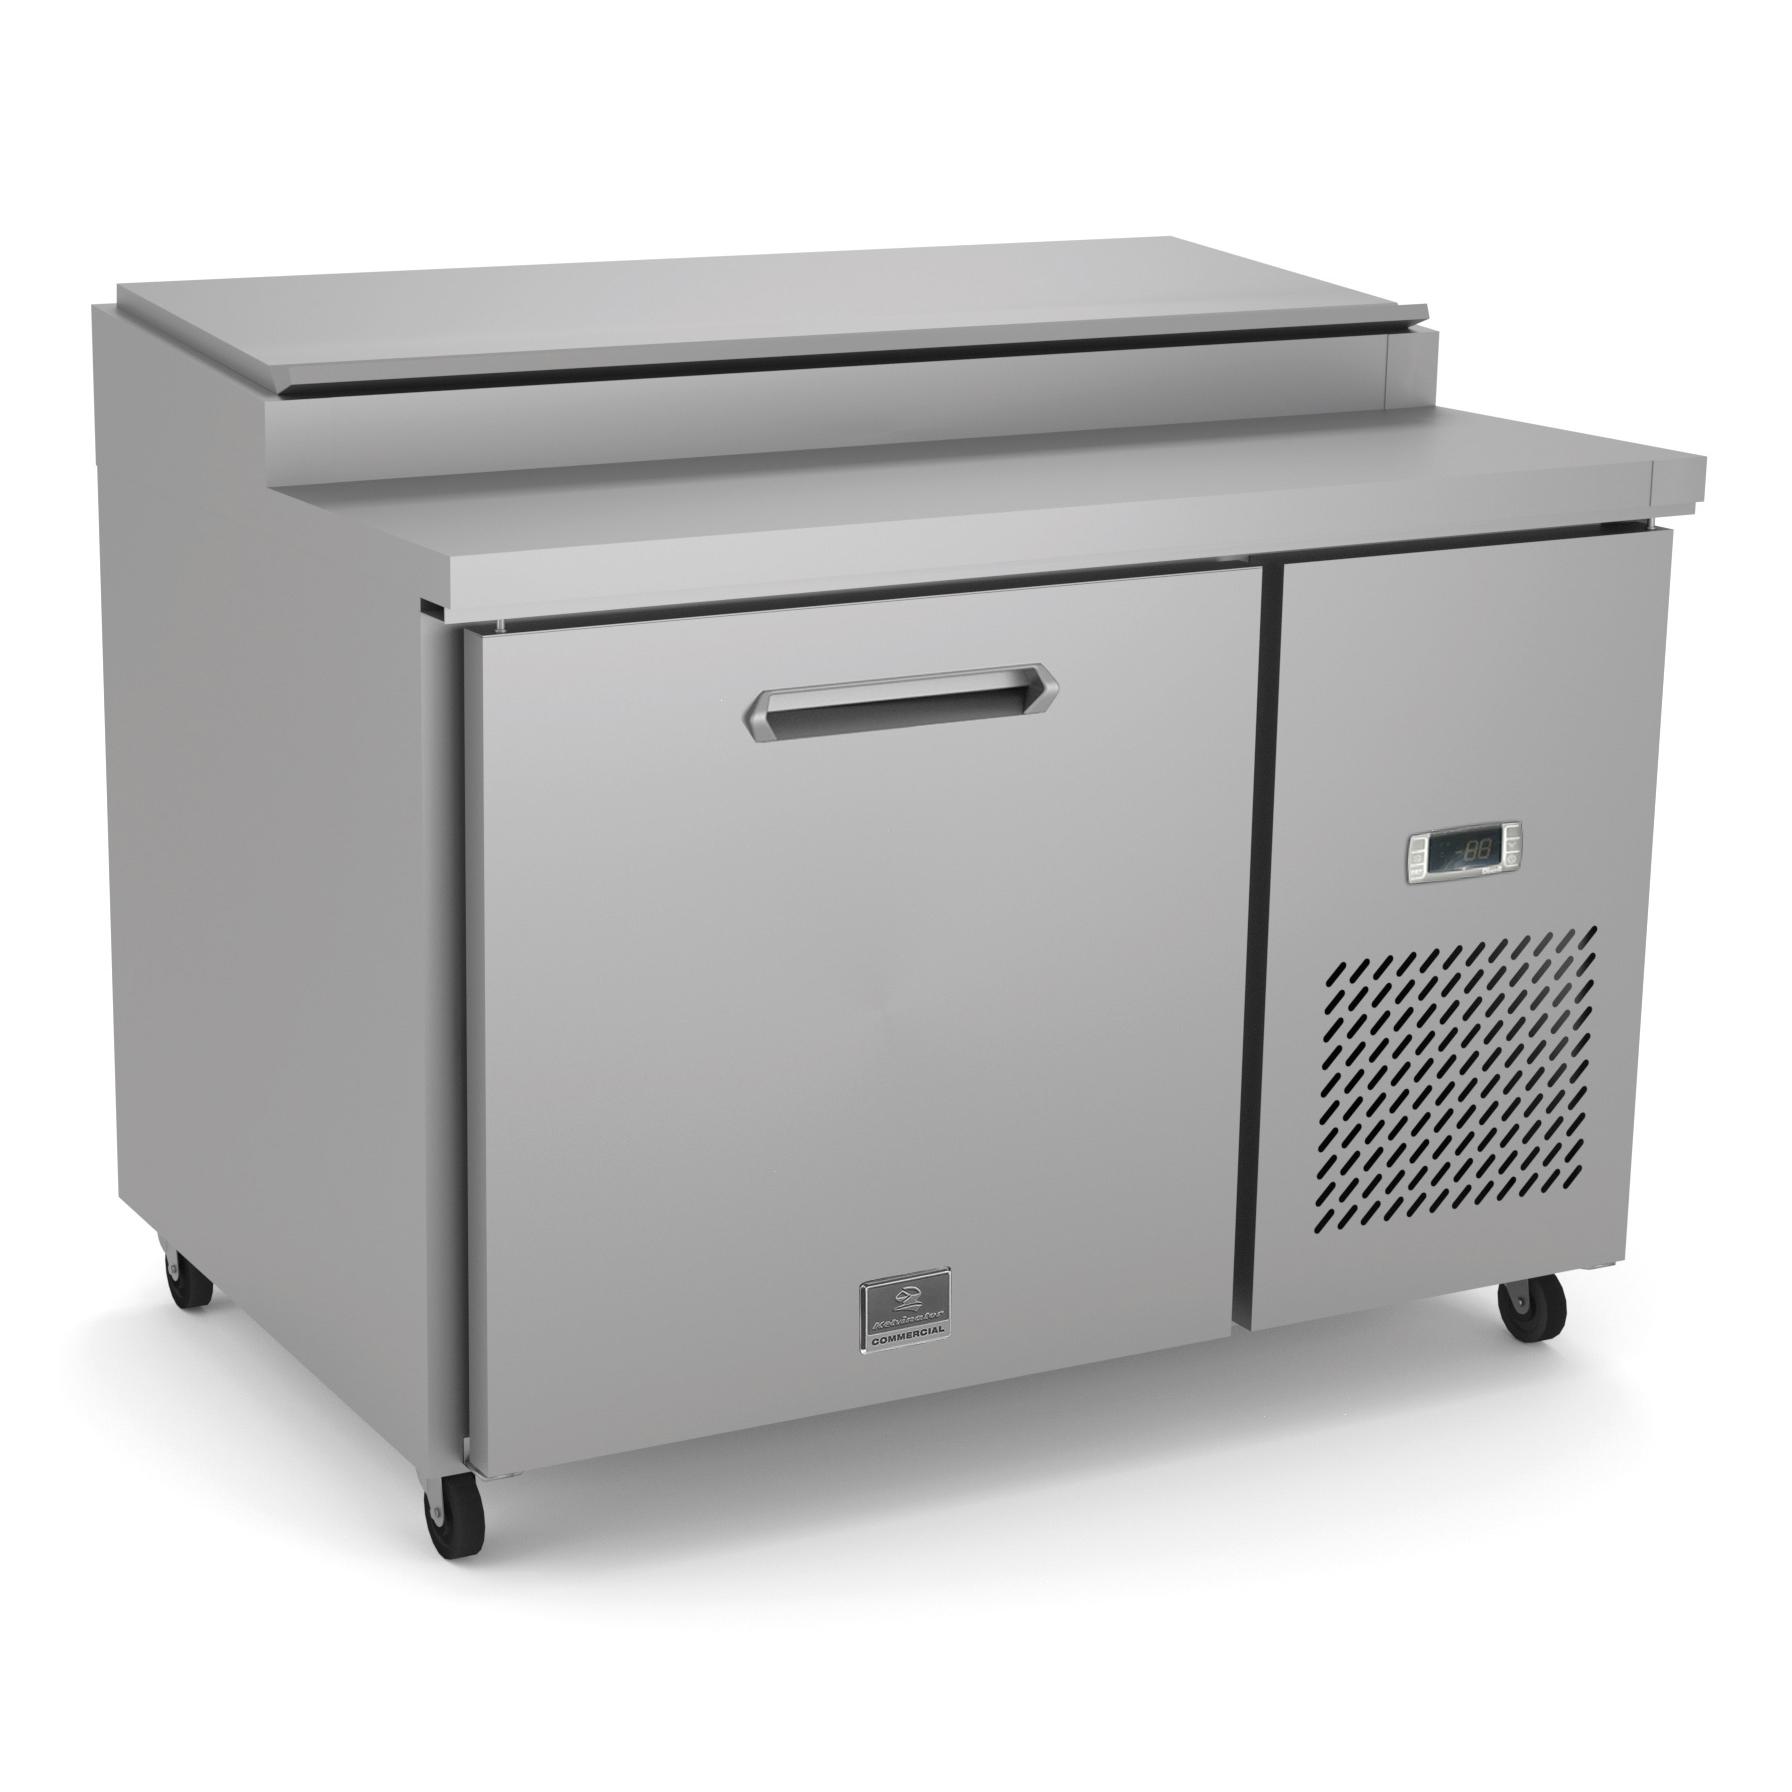 Kelvinator Commercial KCHPT50.6 refrigerated counter, pizza prep table